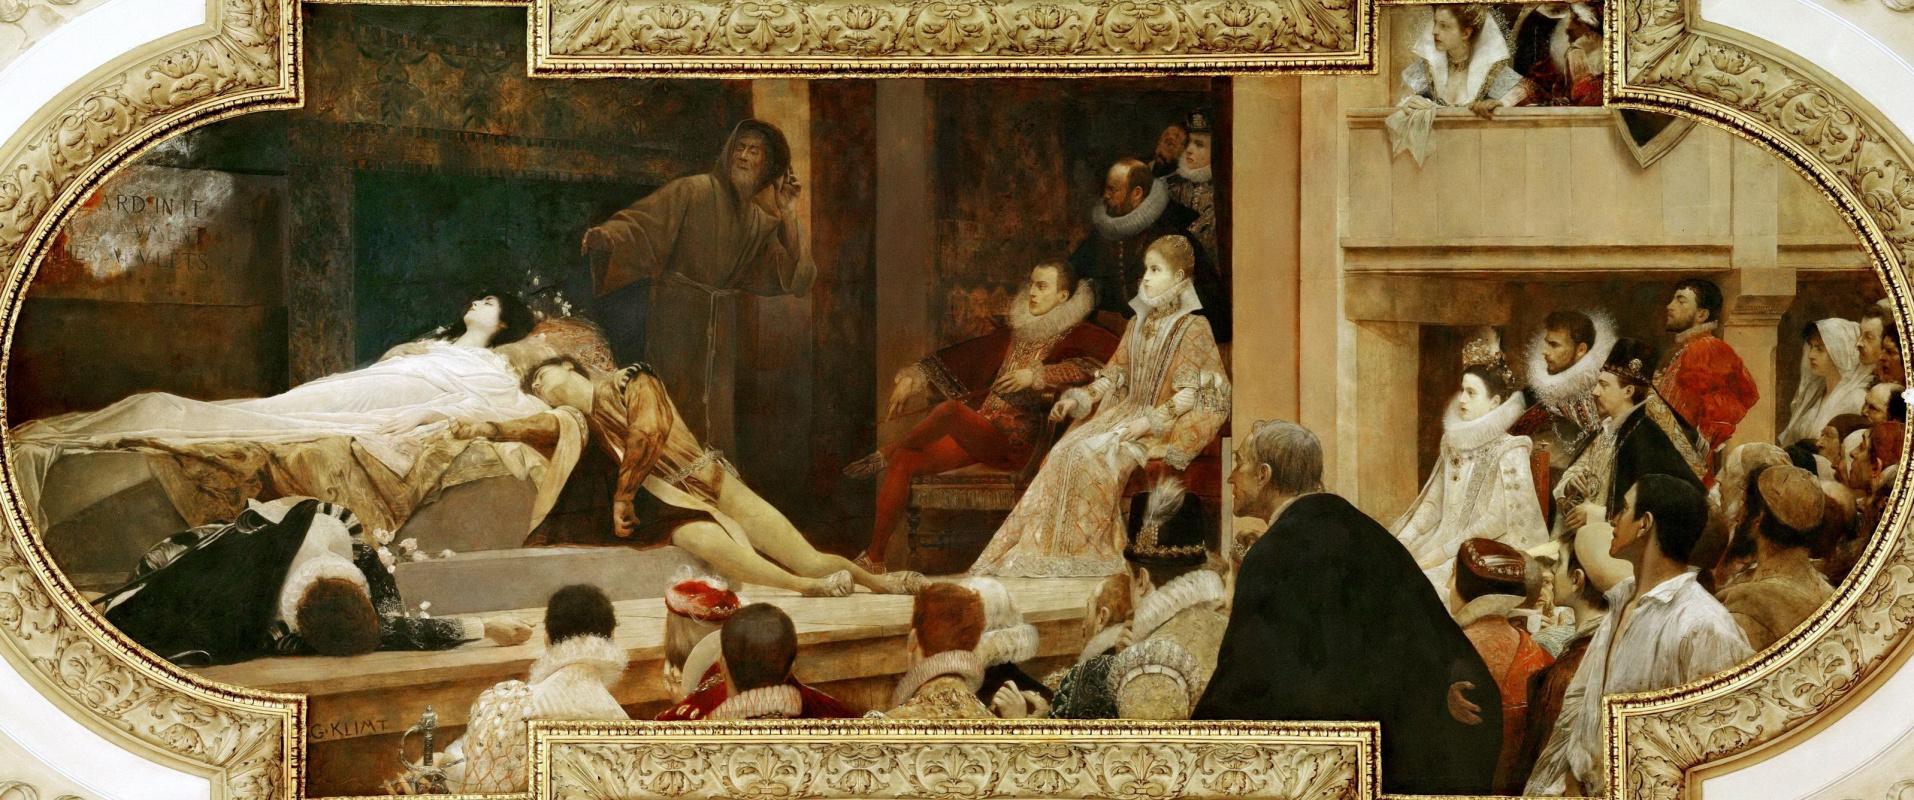 Gustav Klimt. Shakespeare theatre (ceiling Painting at the Burgtheater in Vienna)